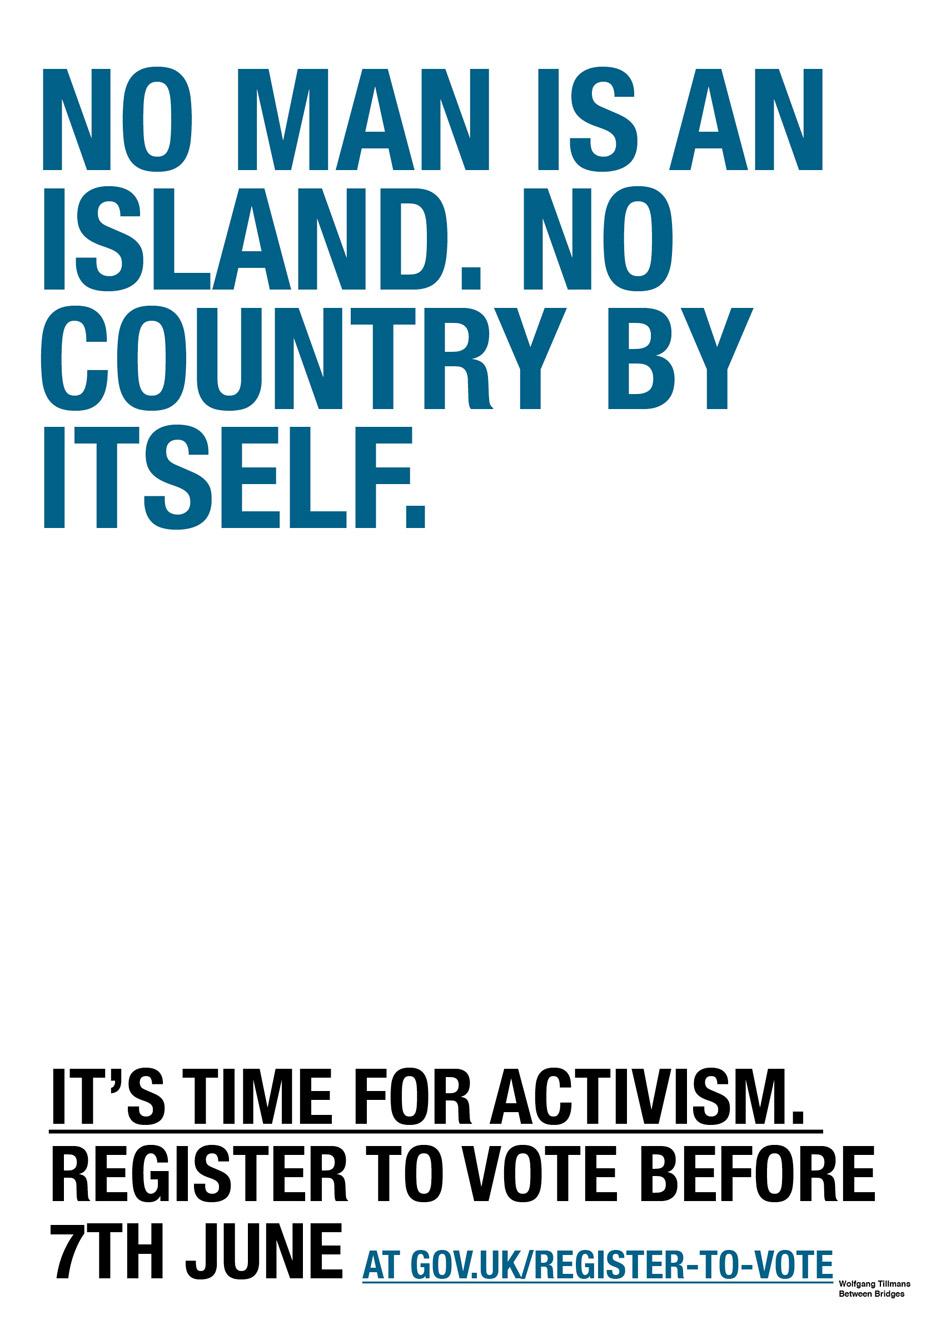 eu-referendum-remain-campaign-posters-by-wolfgang-tillmans_dezeen_936_0